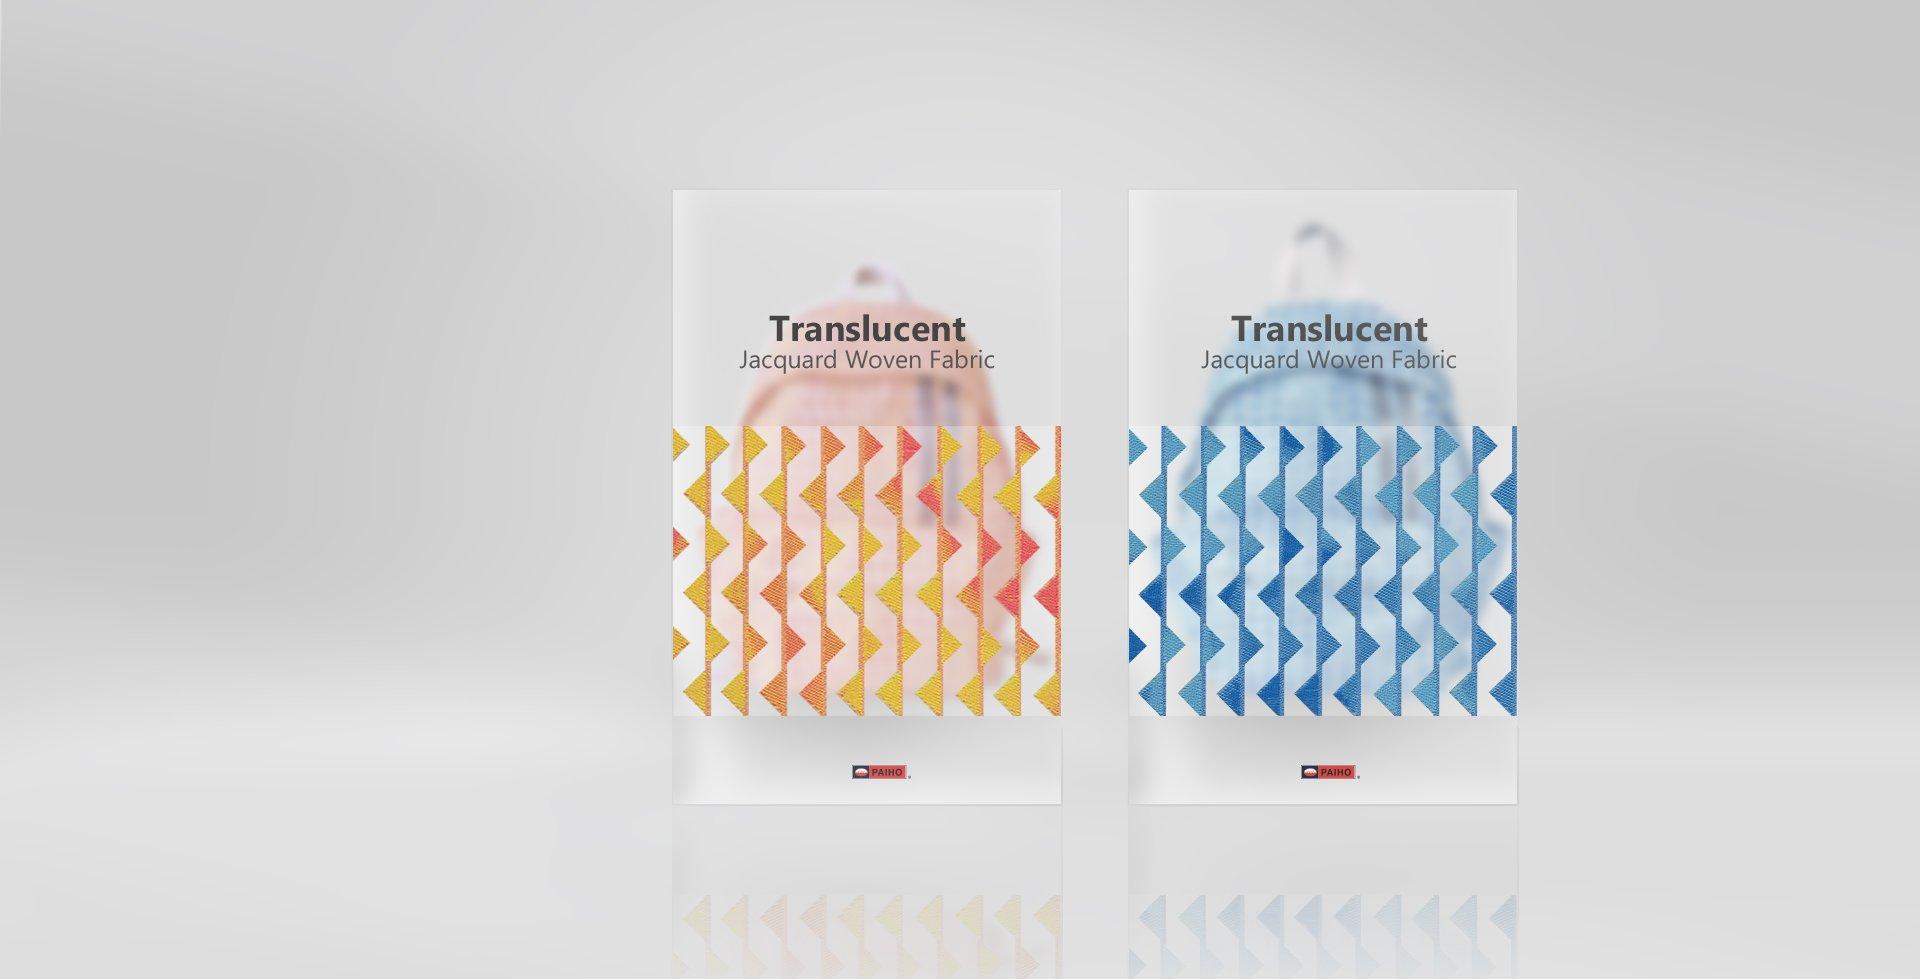 透感緹花梭織布 Translucent Jacquard Woven Fabric